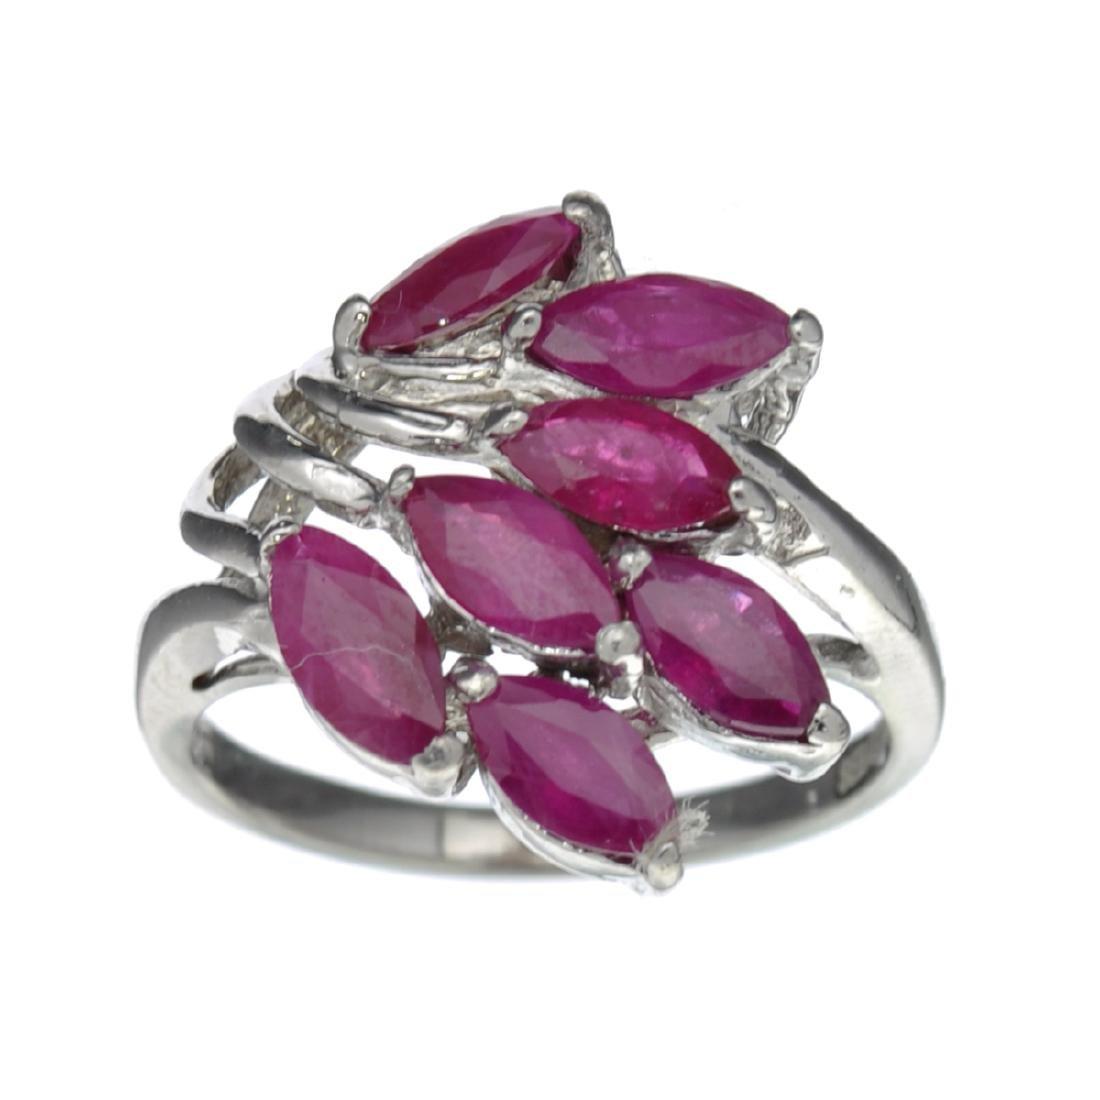 APP: 0.8k Fine Jewelry Designer Sebastian, 1.05CT